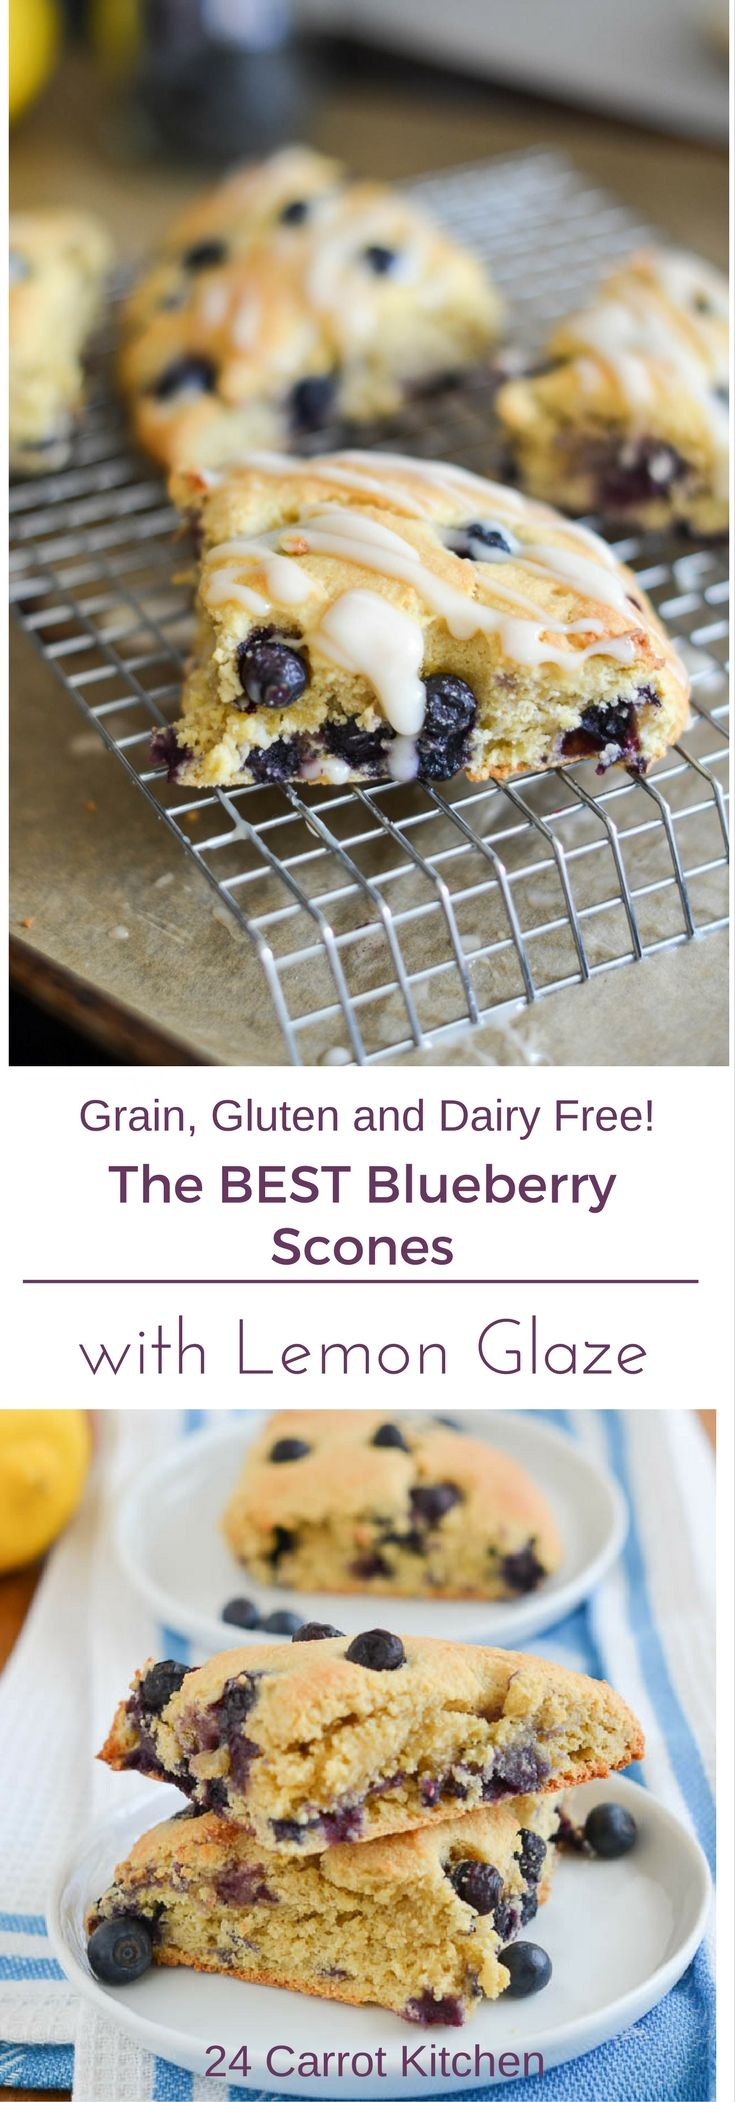 Gluten Free Blueberry Scones Pin 24 Carrot Kitchen